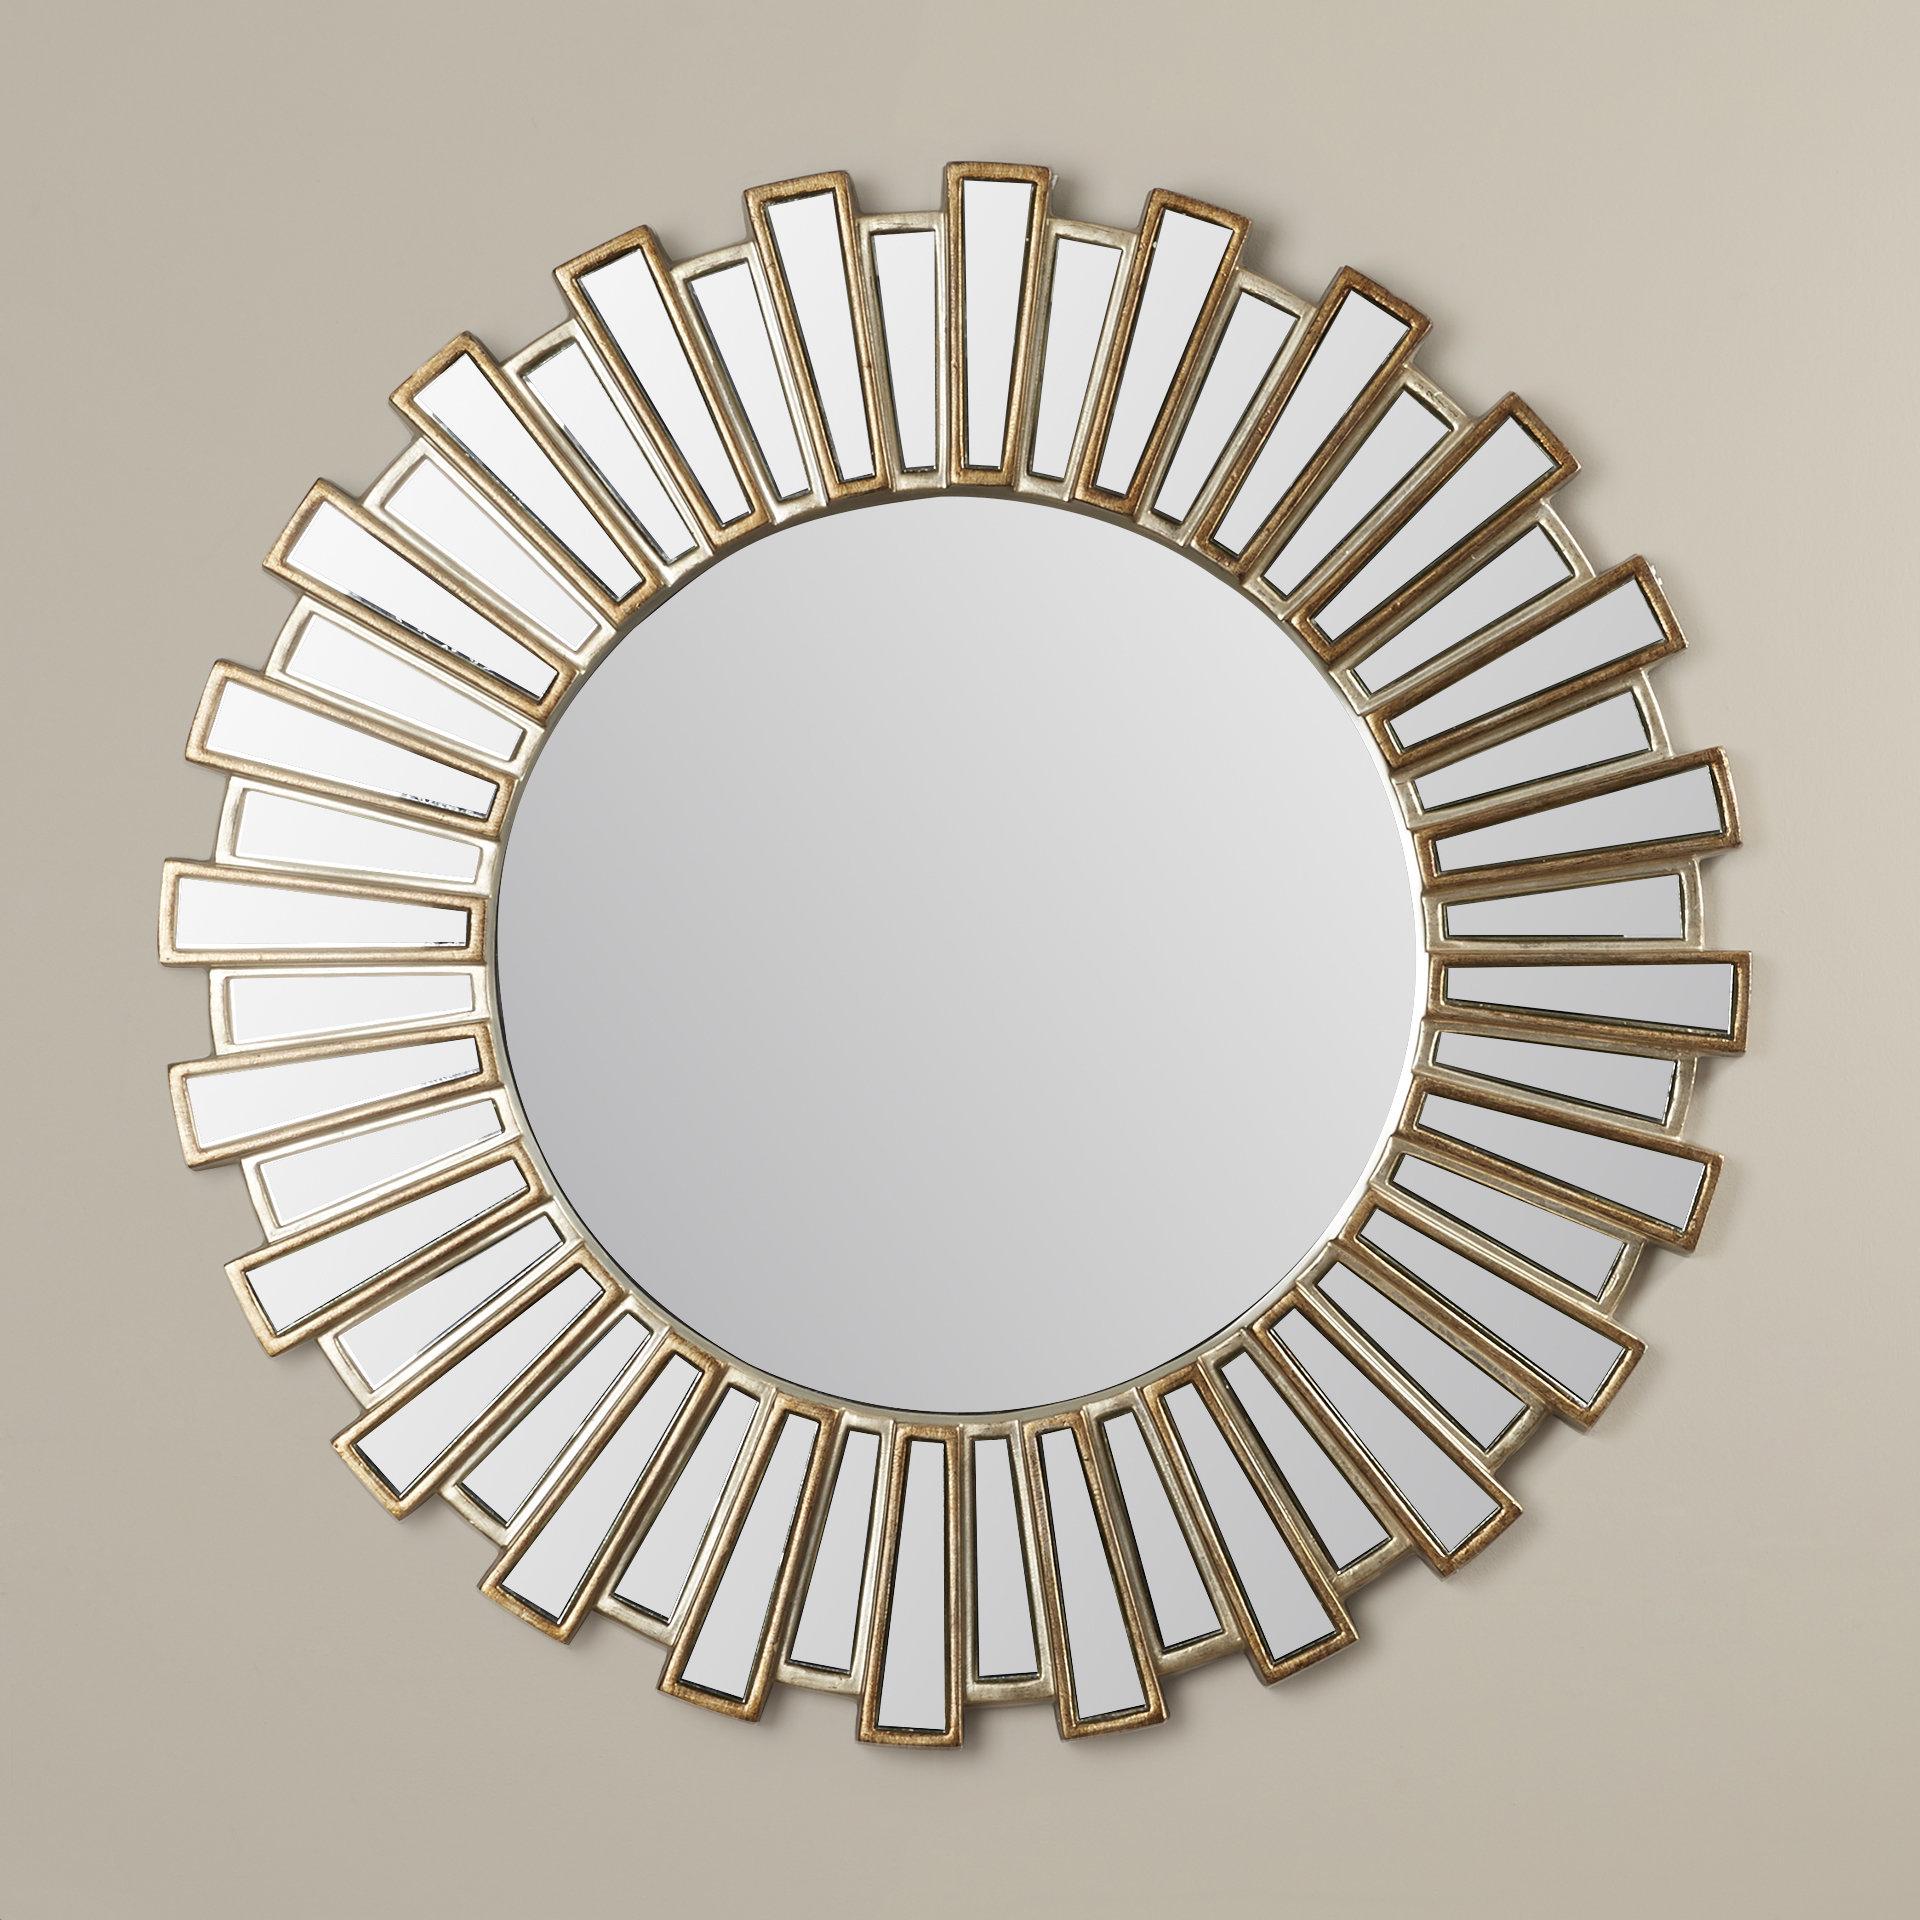 Sunburst Wall Mirrors You'll Love In 2019 | Wayfair Pertaining To Jarrod Sunburst Accent Mirrors (Image 18 of 20)